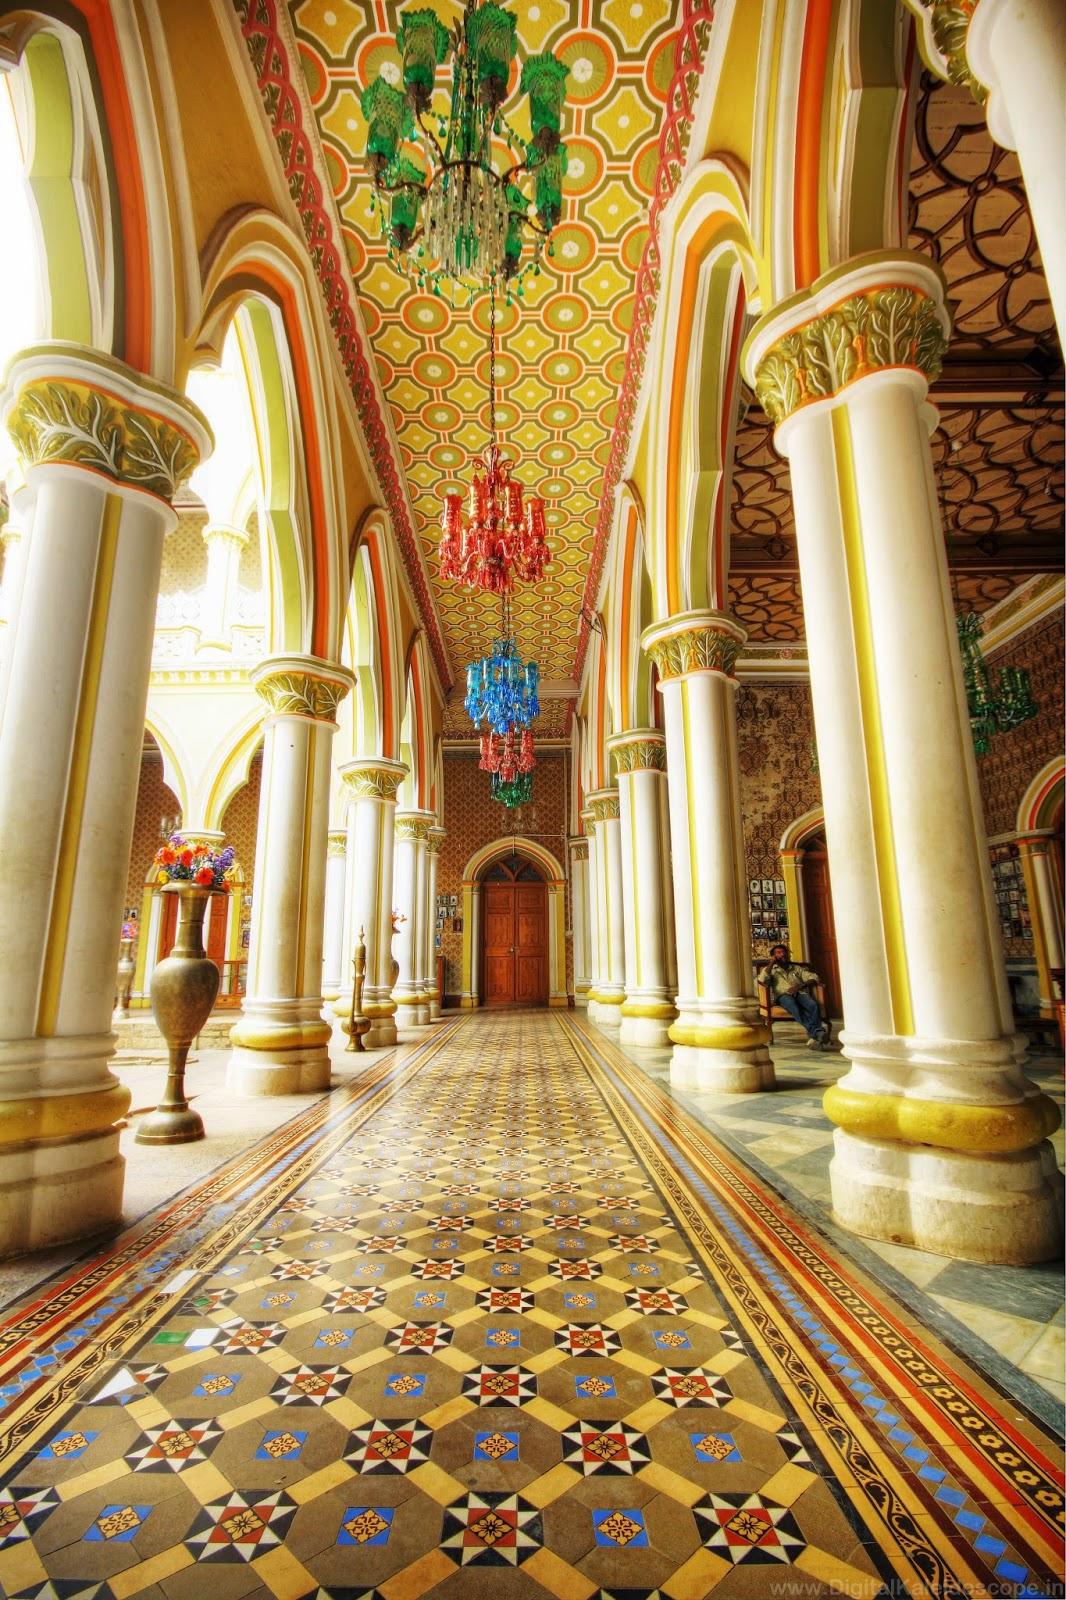 THE GRAND BANGALORE PALACE - DigitalKaleidoscope